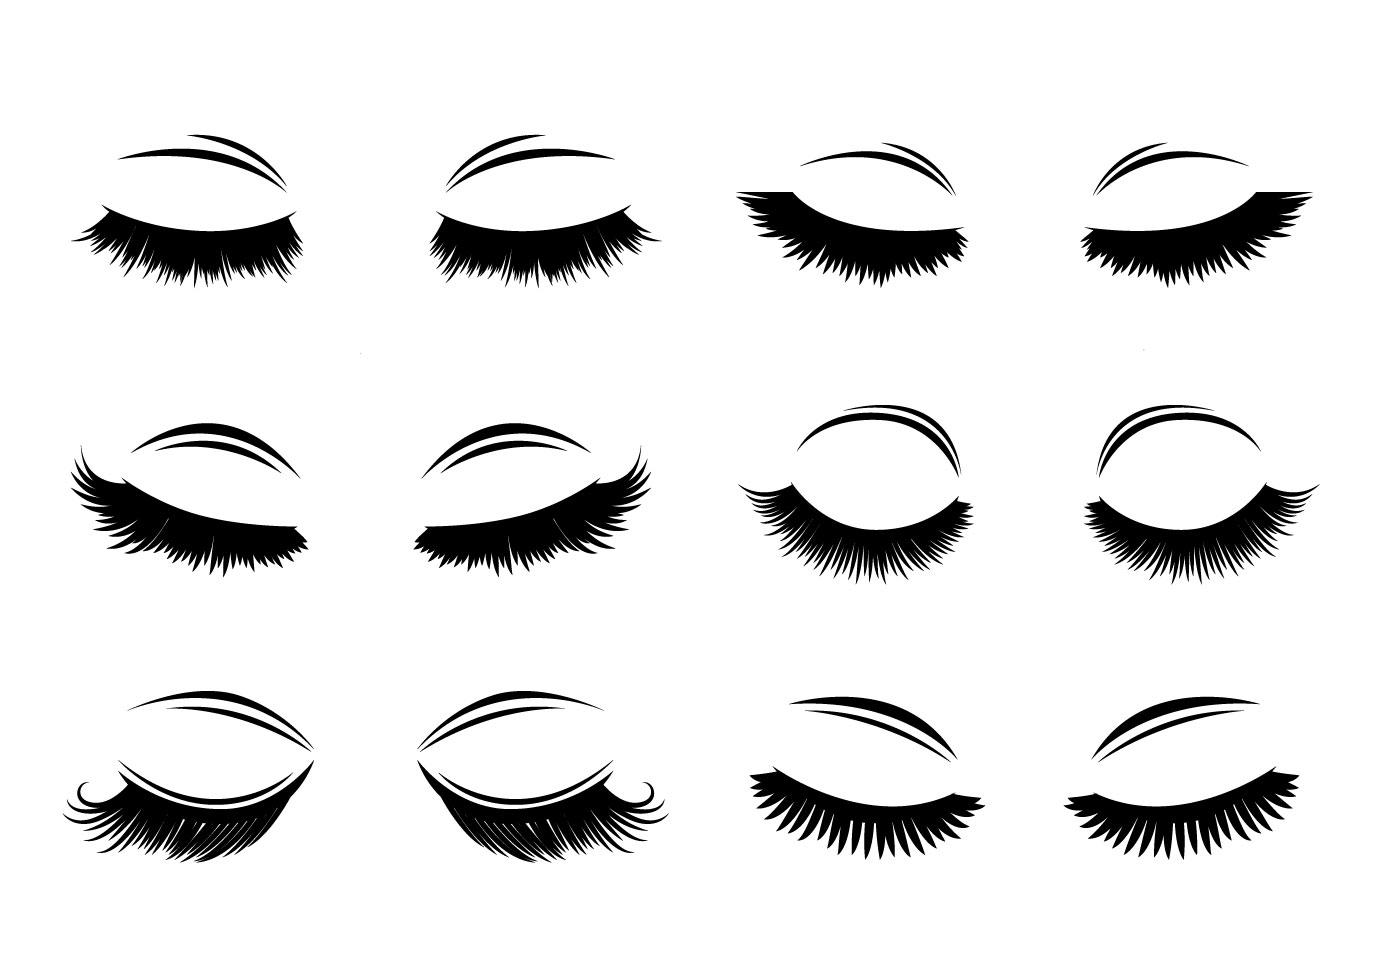 Eyelashes Free Vector Art - (5,409 Free Downloads)